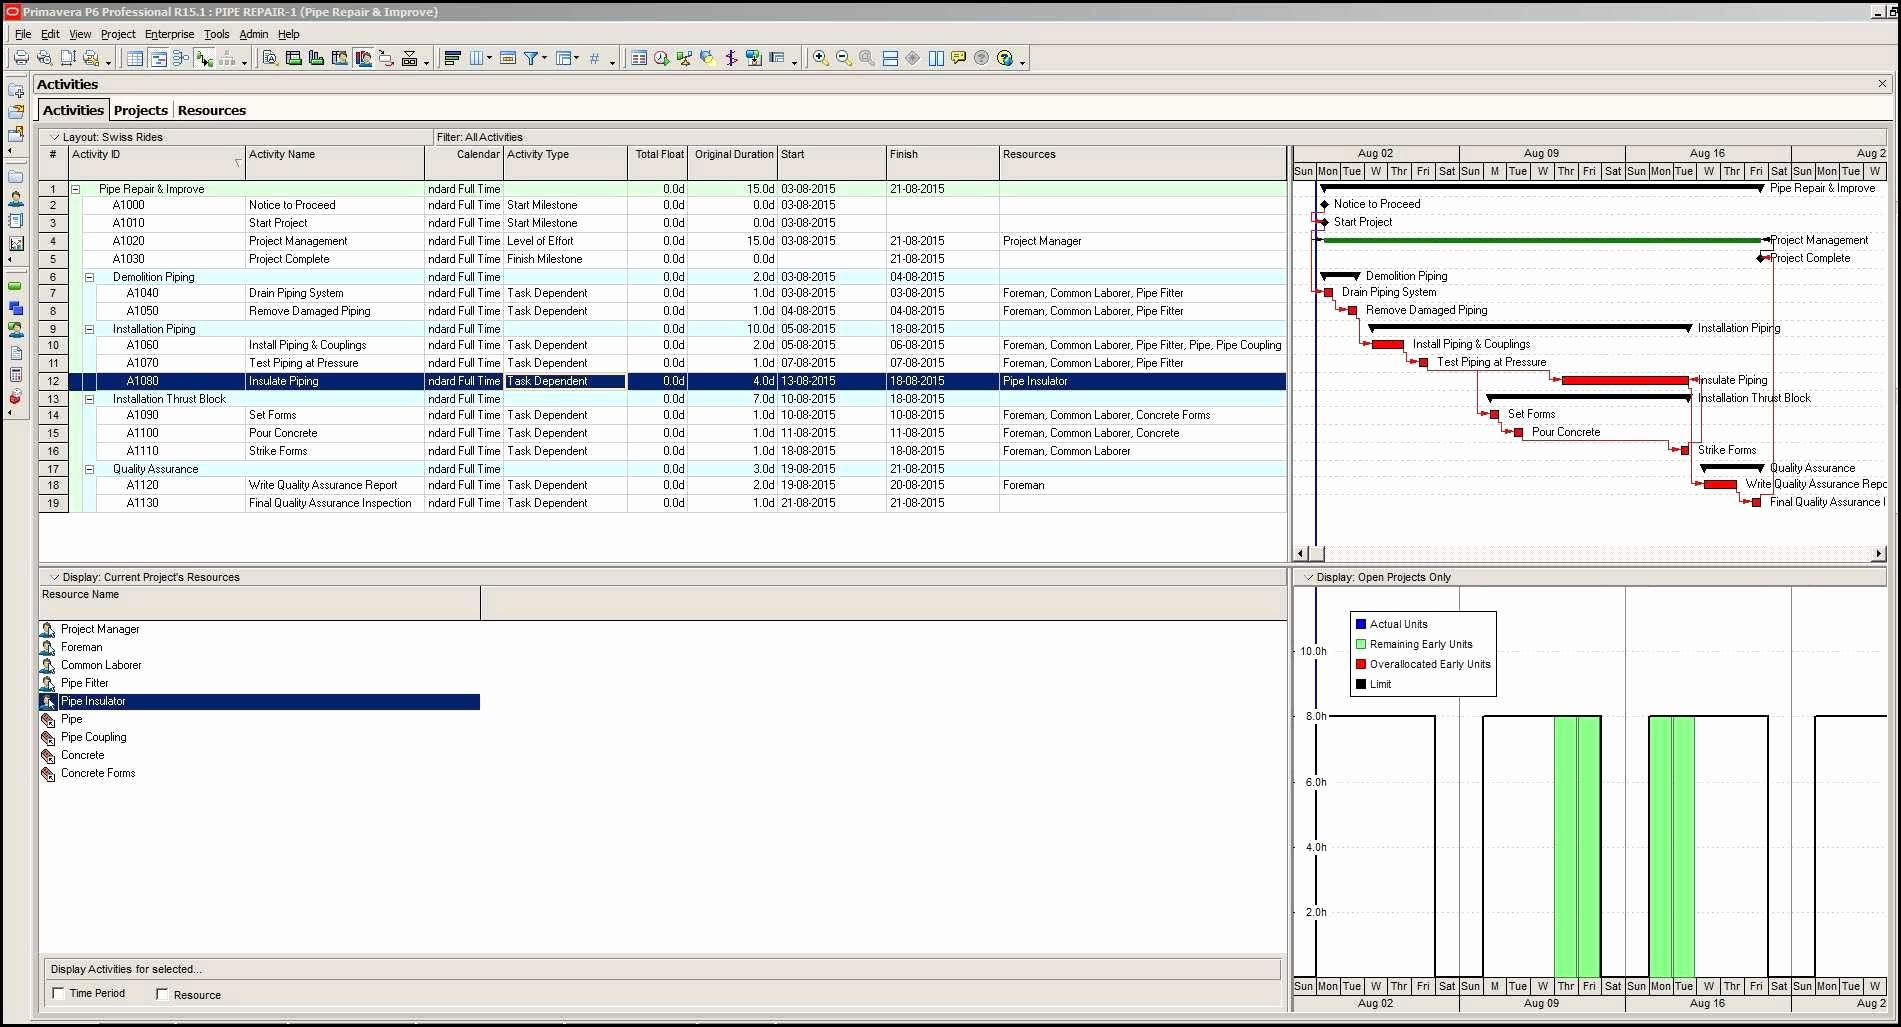 Excel Spreadsheet Classes In Excel Spreadsheet Classes Beautiful Free Weekly Employeechedule